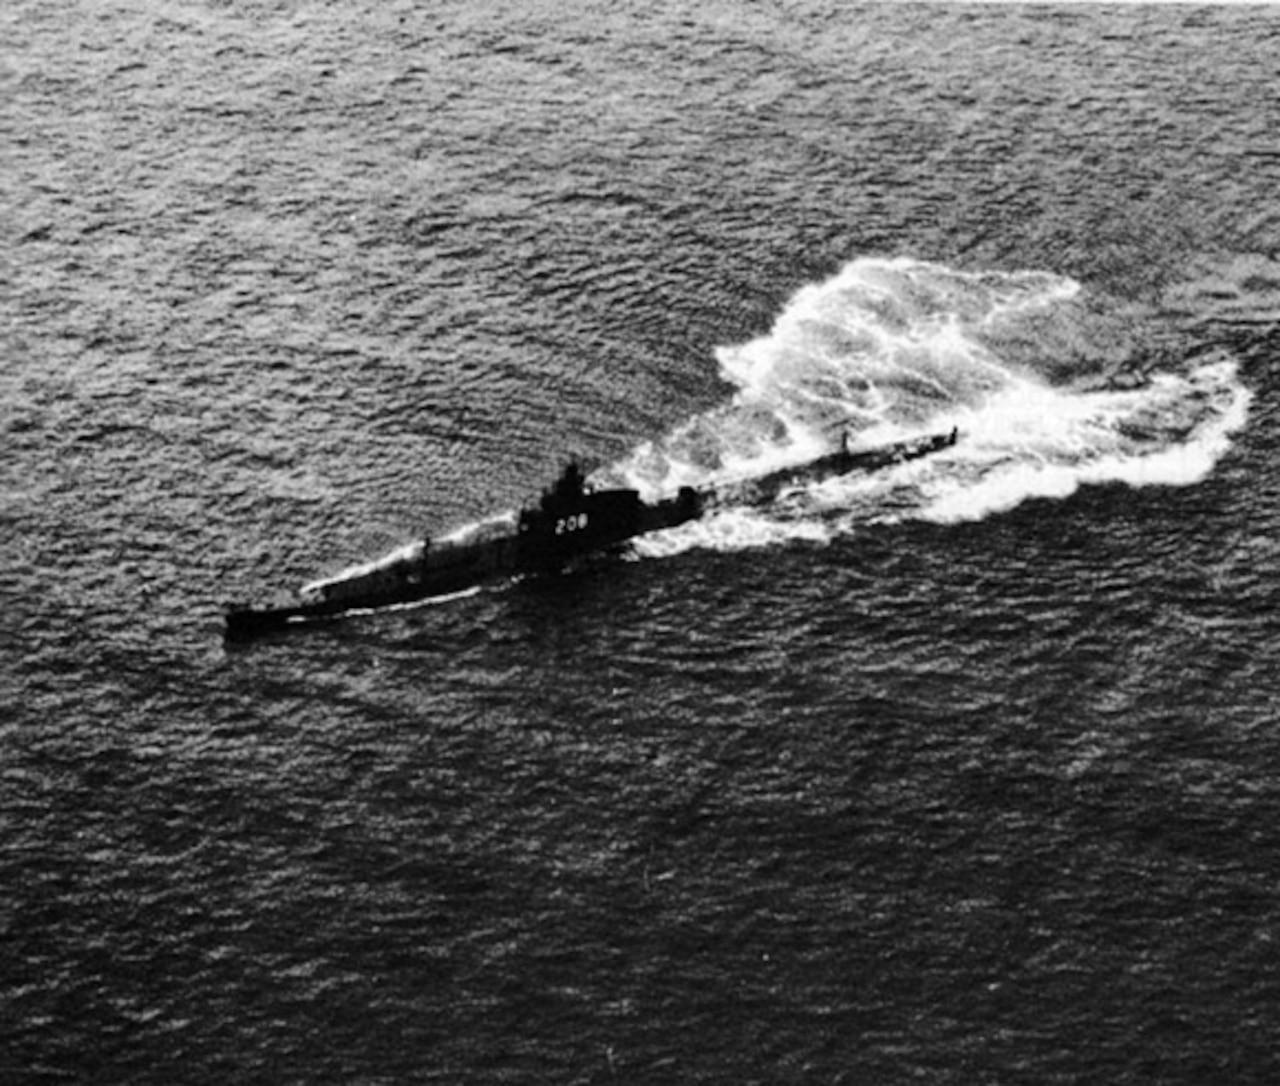 A 1940's era submarine chugs along above water.